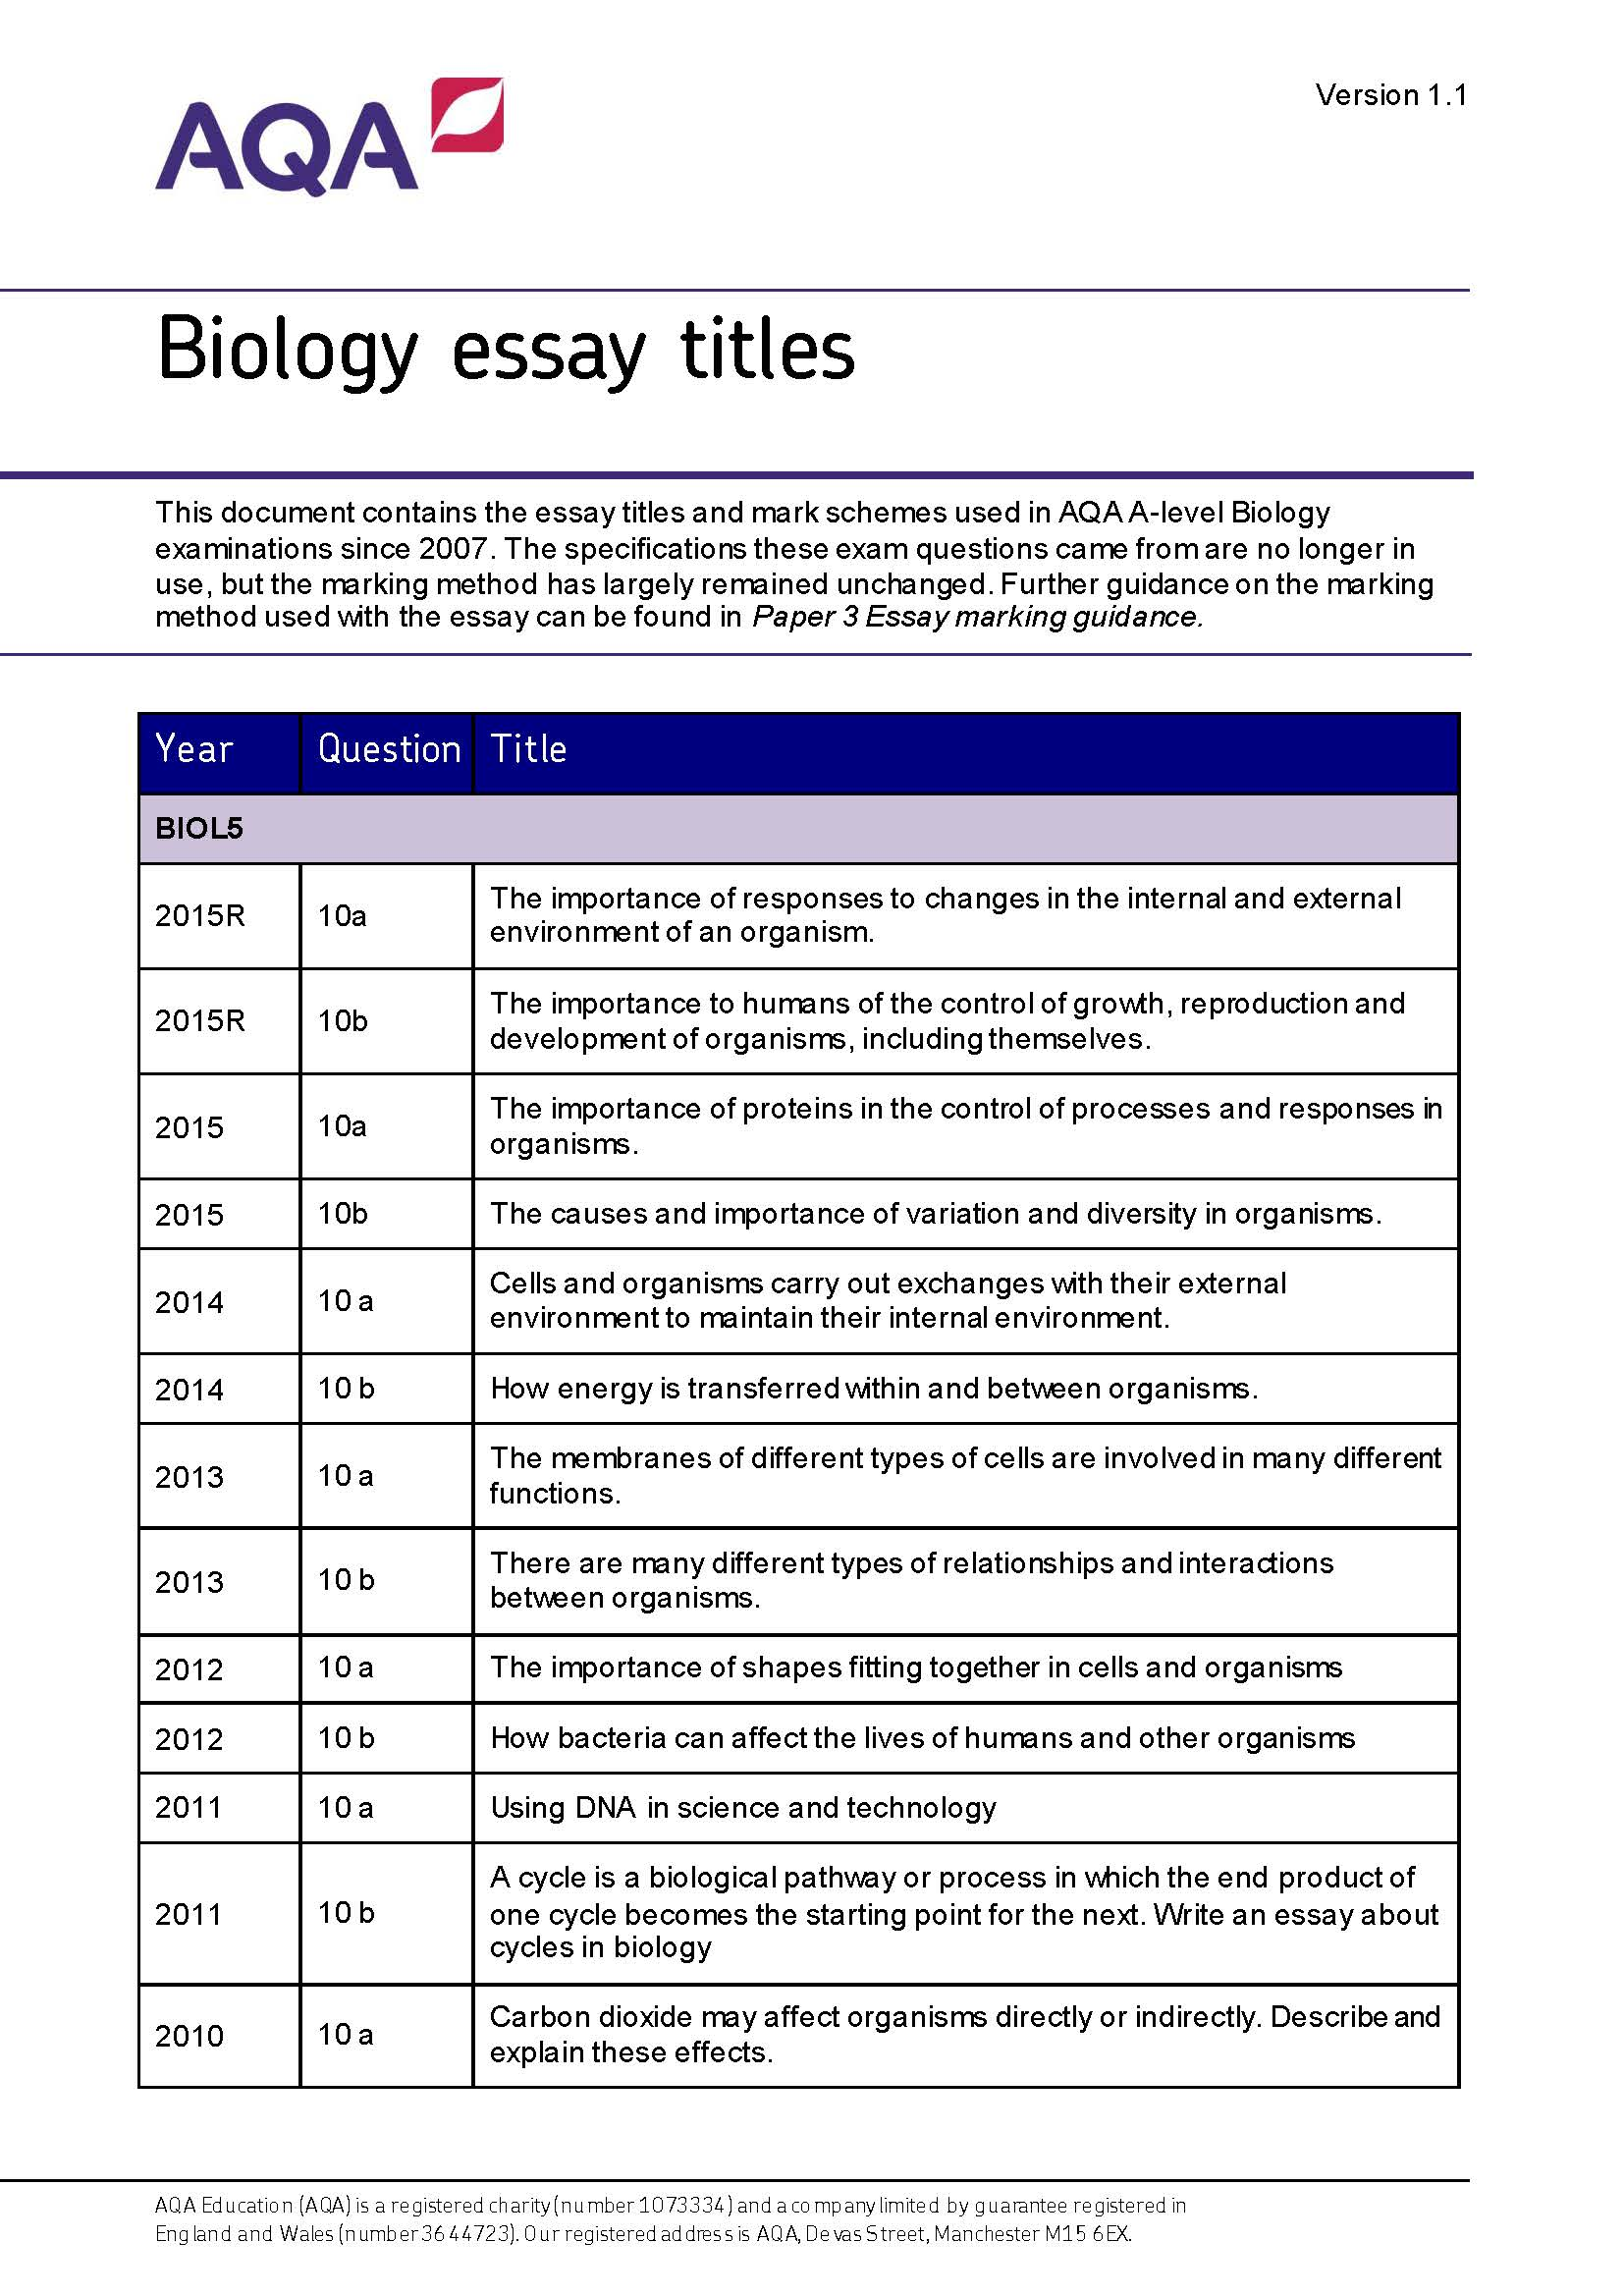 aqa synoptic essay cycles in biology